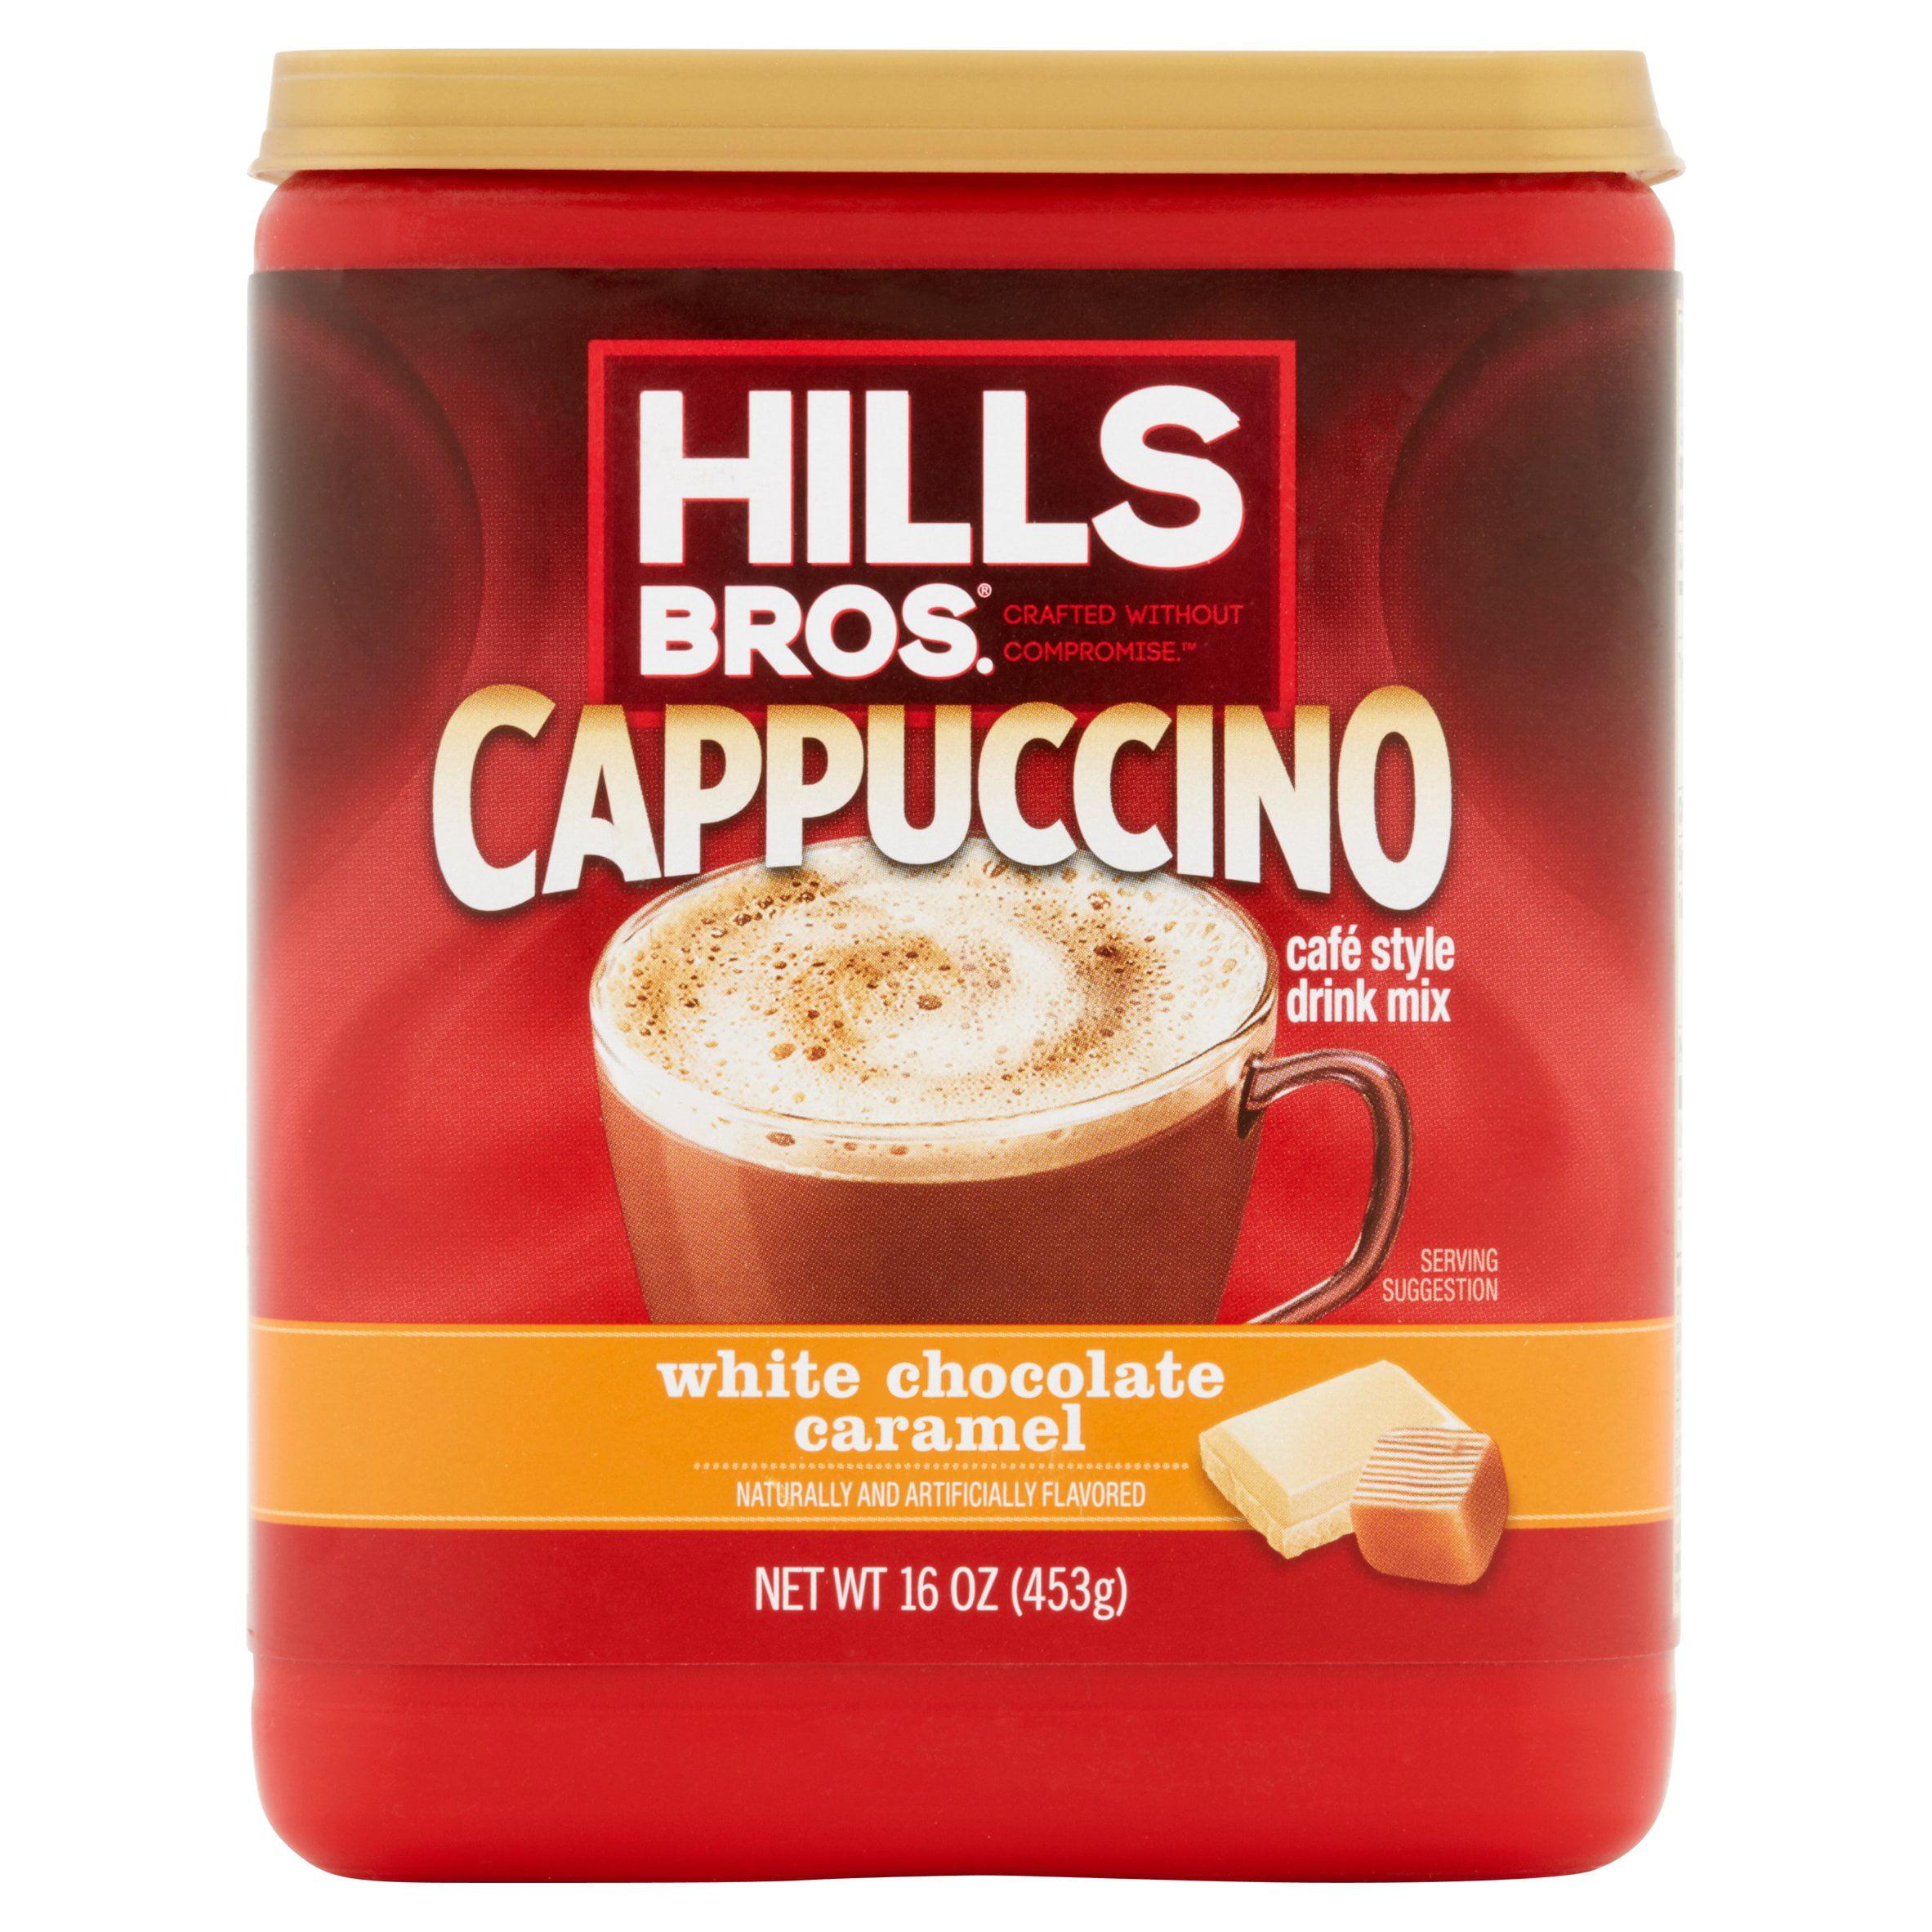 Hills Bros. White Chocolate Caramel Cappuccino Drink Mix, 16 oz ...